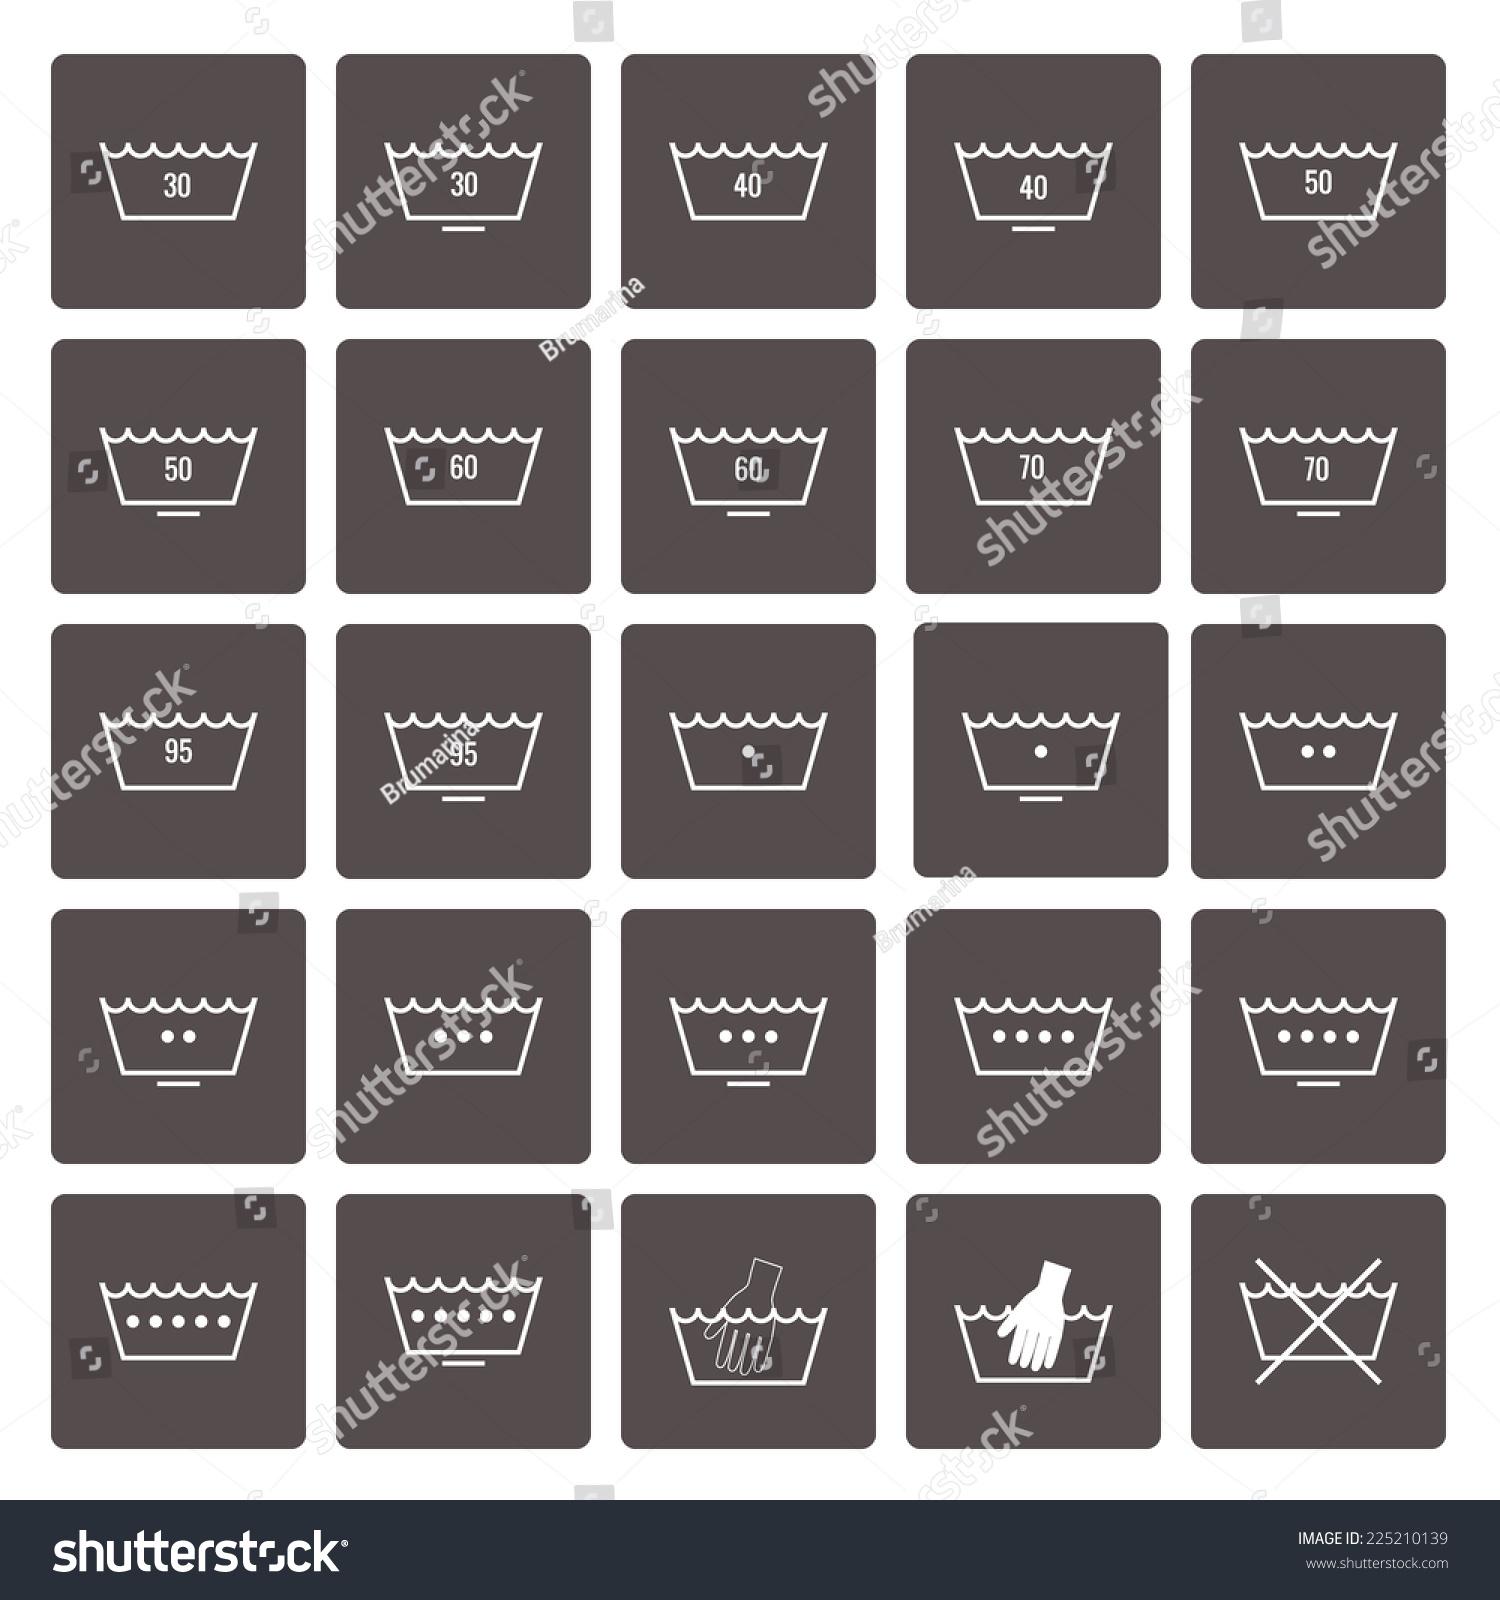 Icon set laundry symbols grey squares stock vector 225210139 icon set laundry symbols grey squares stock vector 225210139 shutterstock biocorpaavc Images